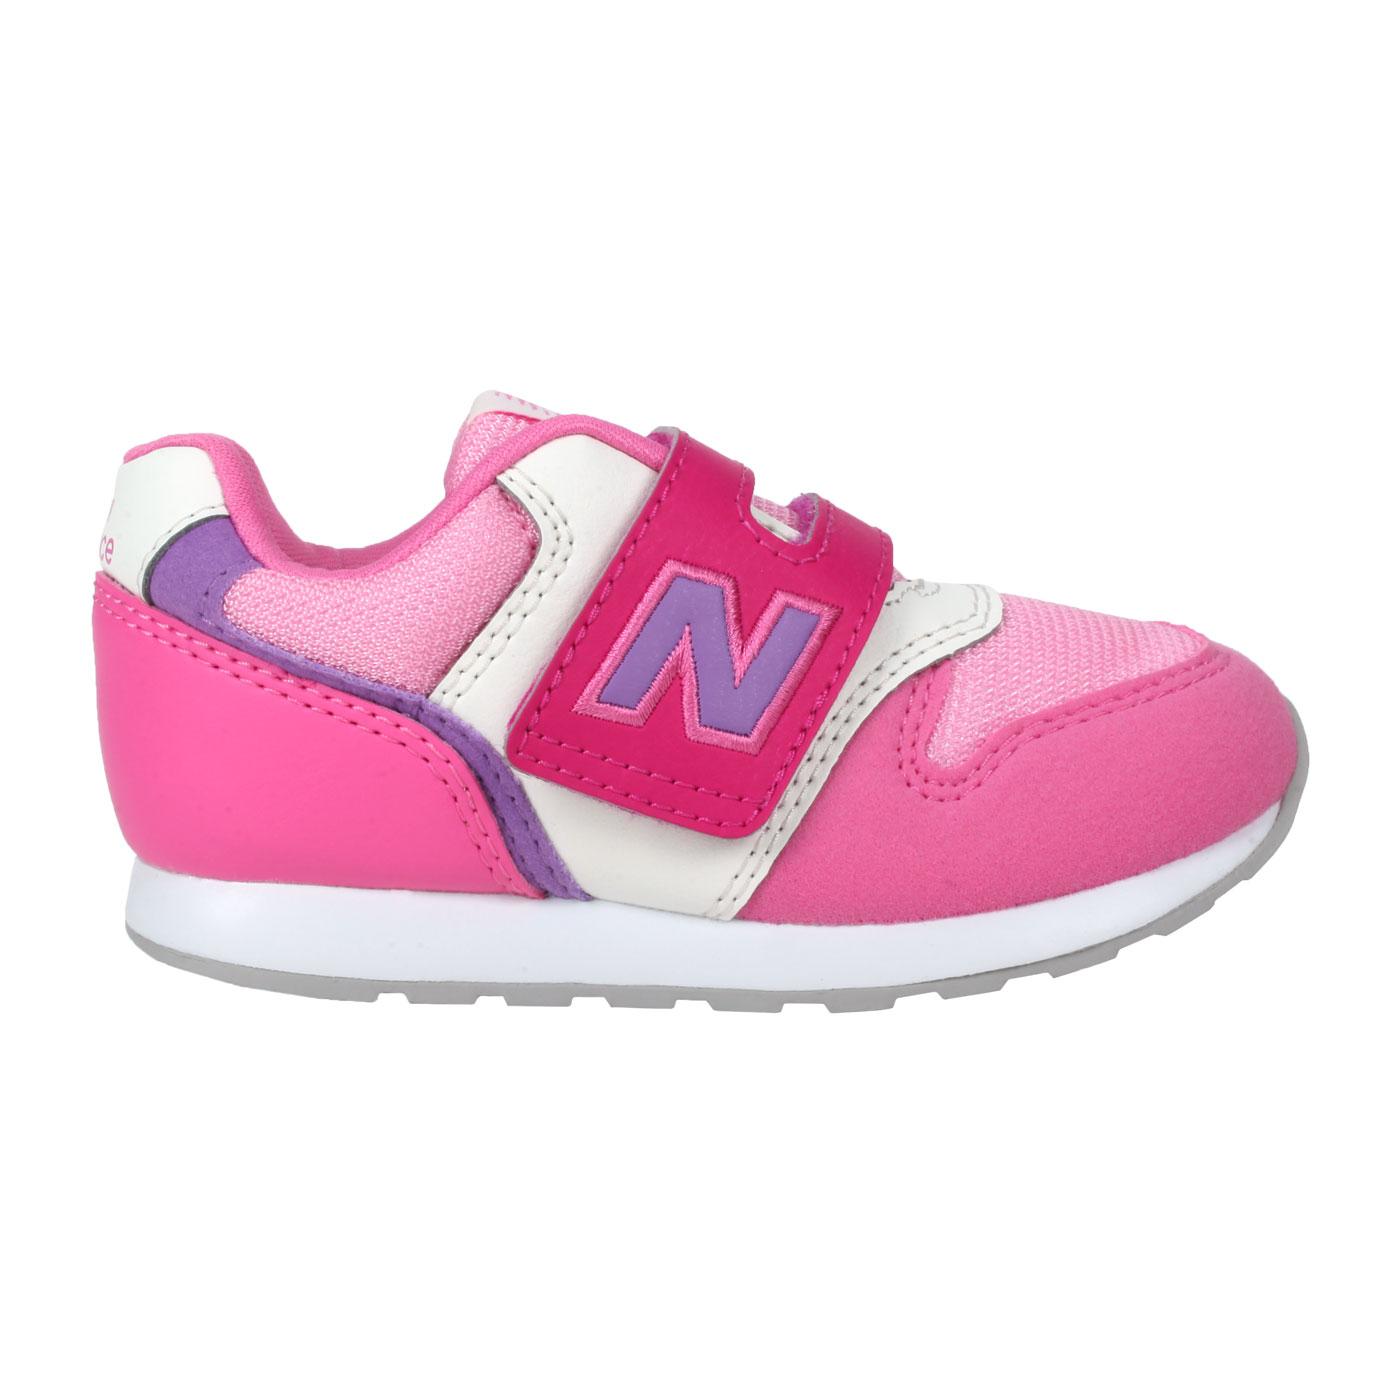 NEW BALANCE 小童休閒運動鞋-WIDE IZ996MPP